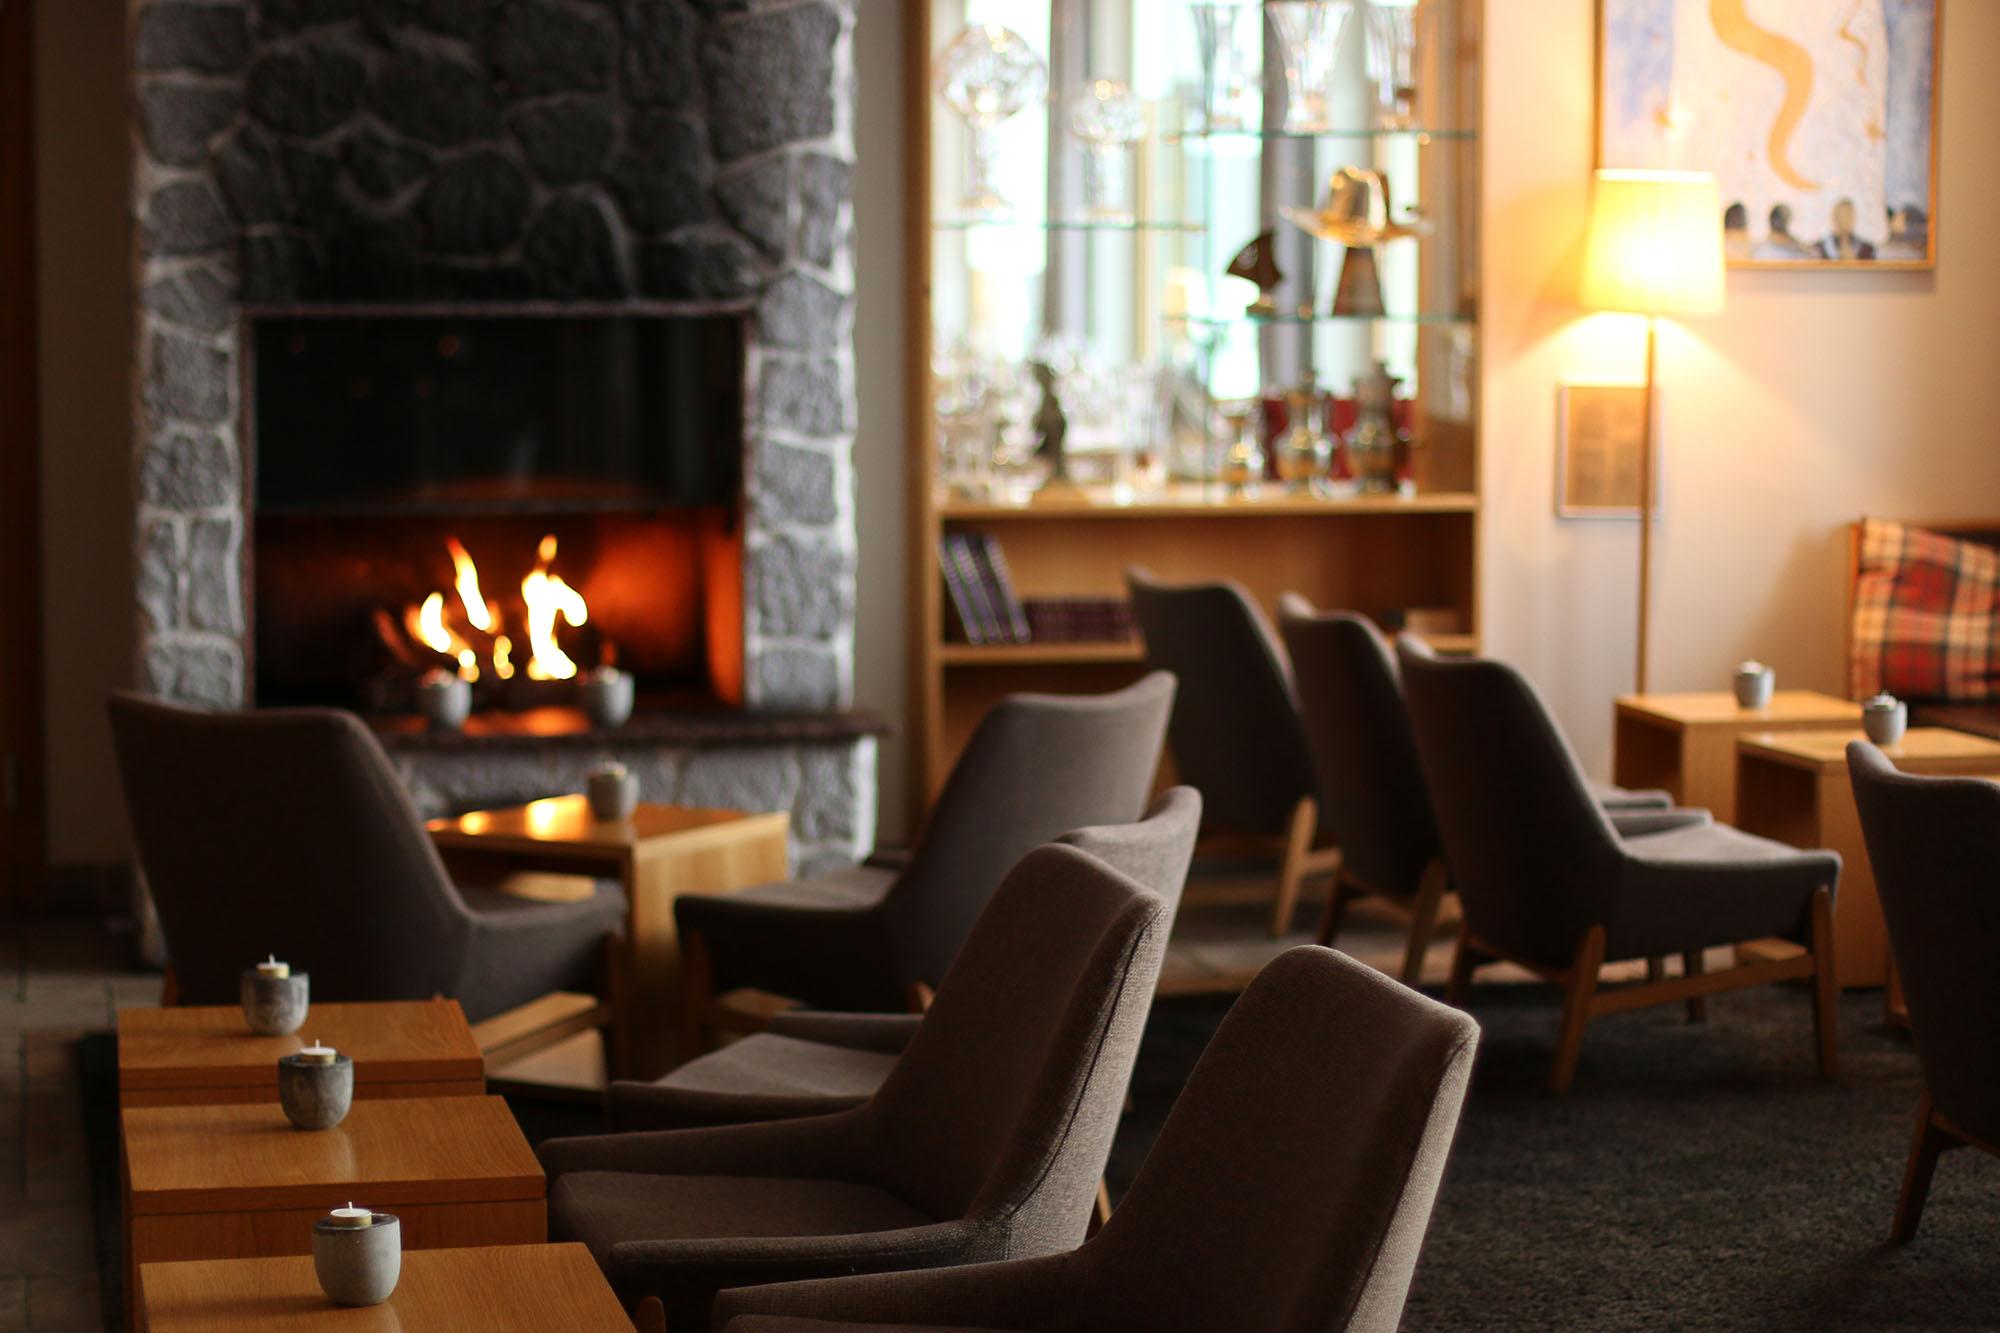 IMG_0383 idre pernilla wiberg hotell x